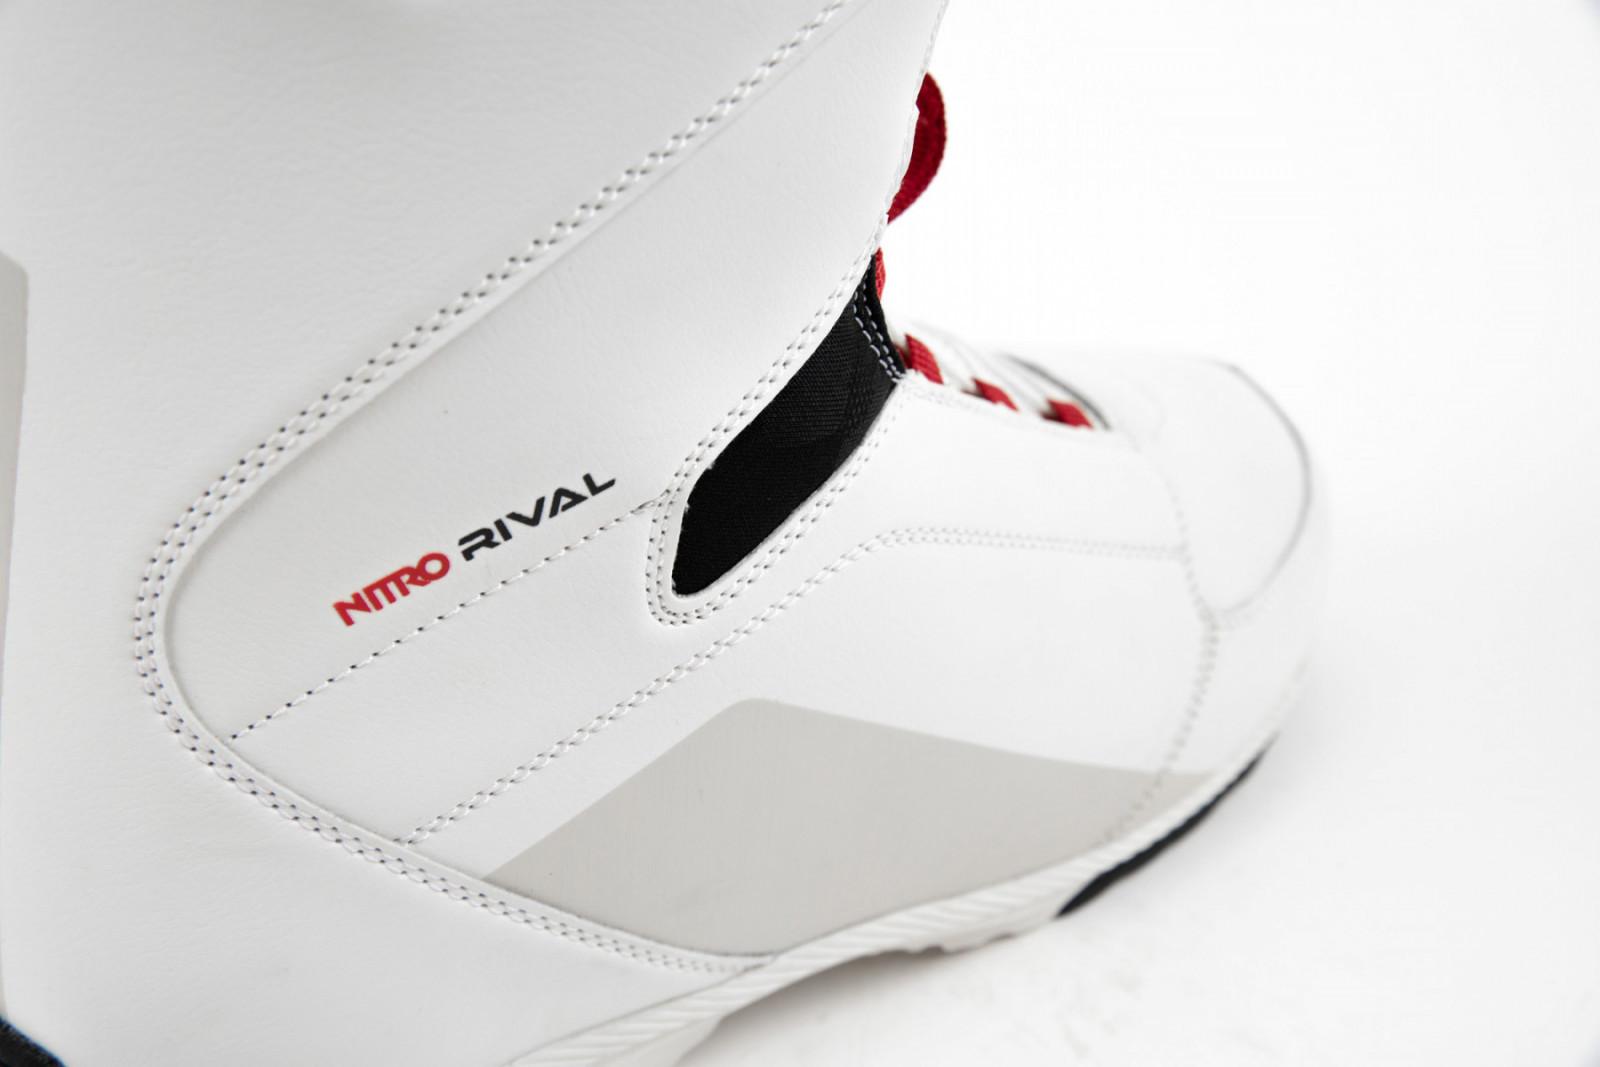 Nitro Rival TLS - white-black-red 2020/2021.